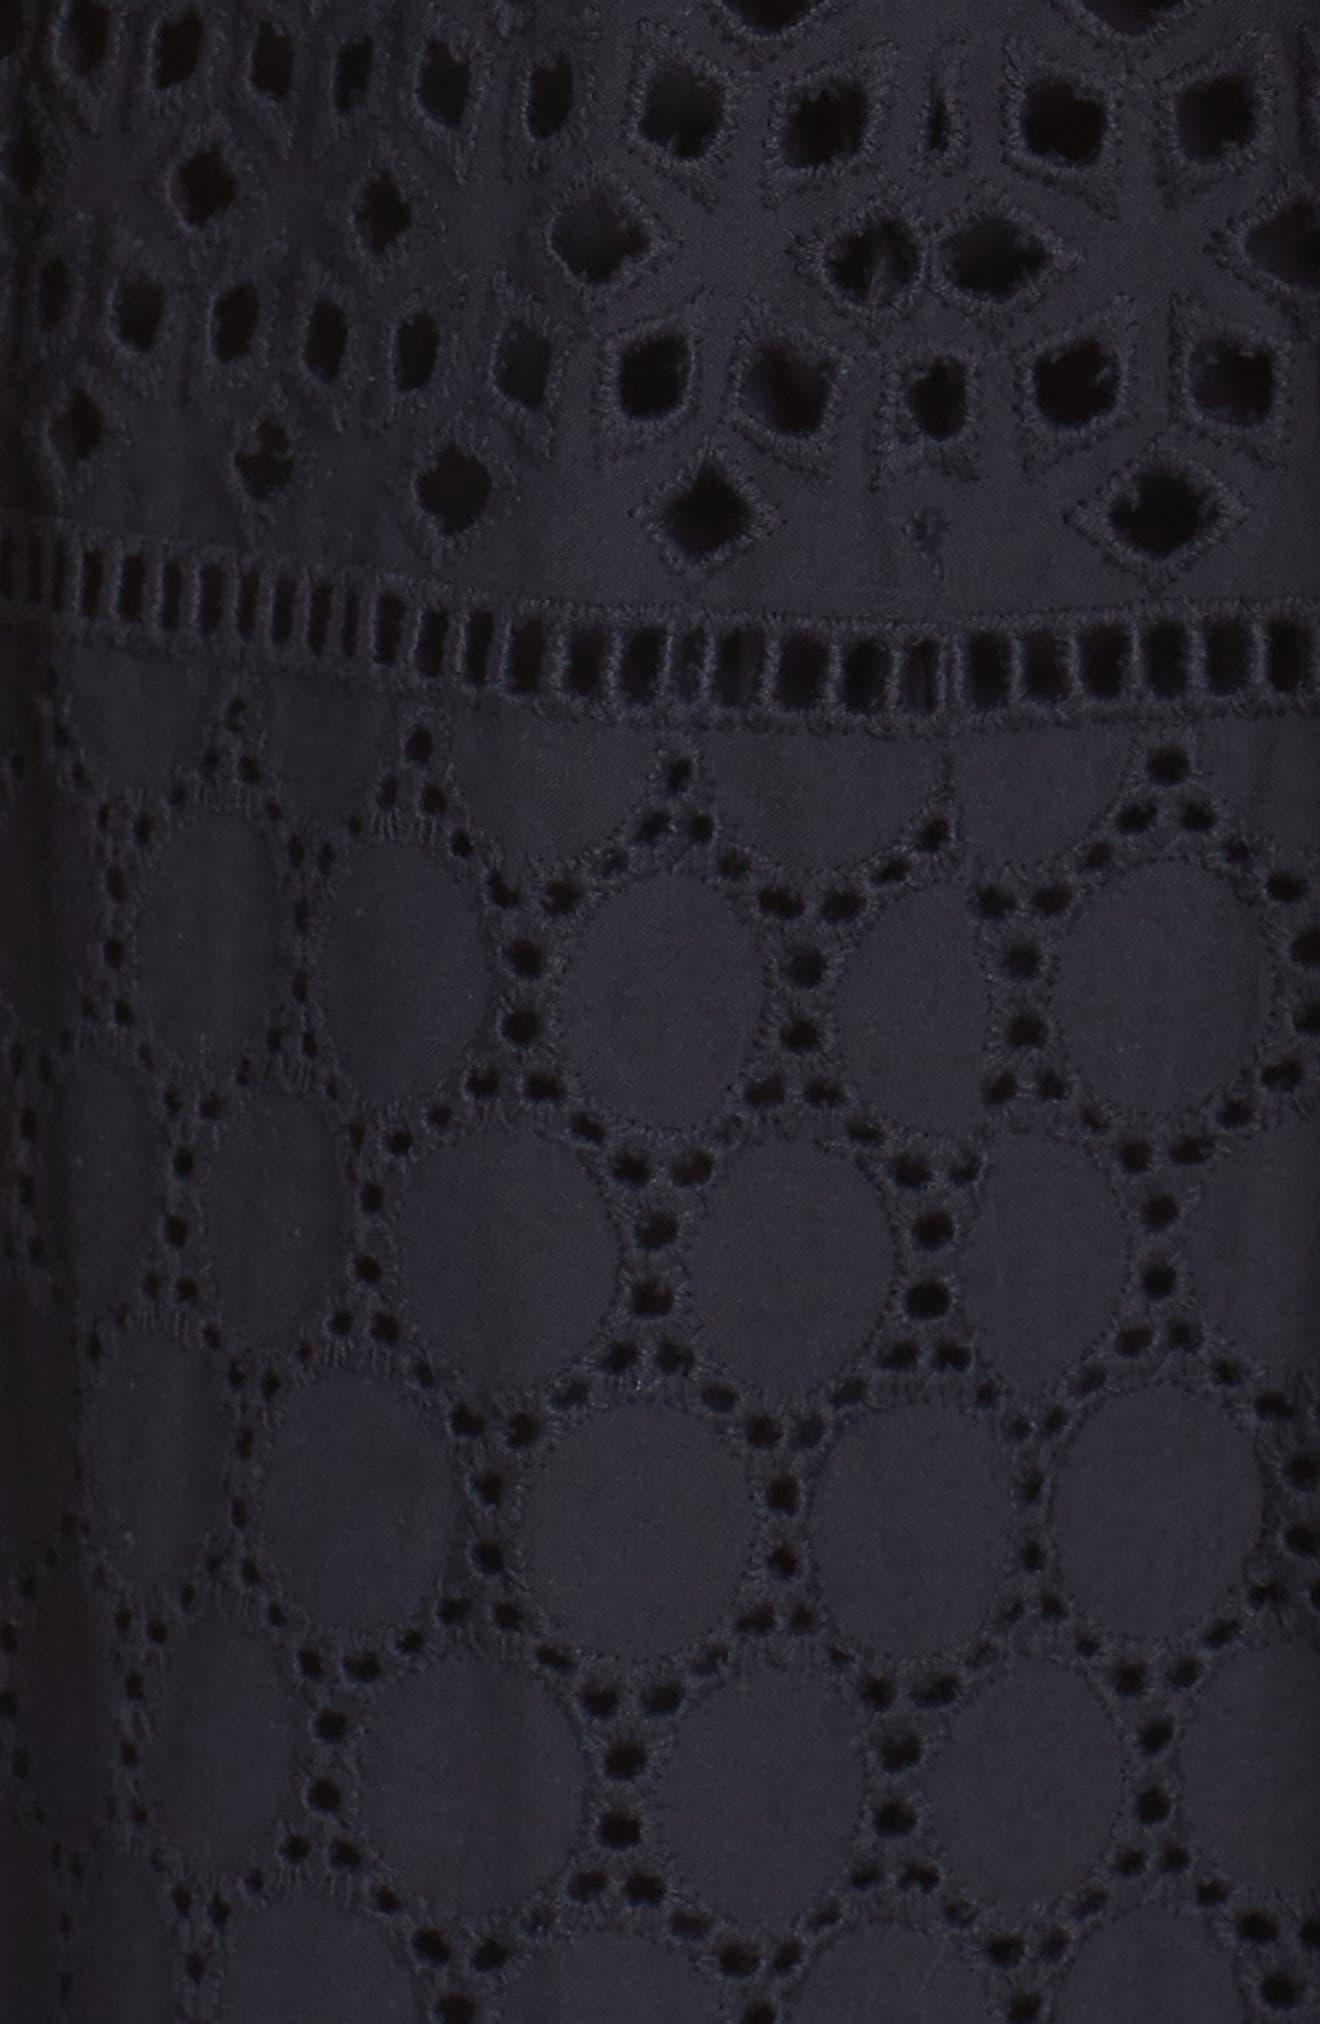 V-Neck Cotton Eyelet Fit & Flare Dress,                             Alternate thumbnail 6, color,                             Navy